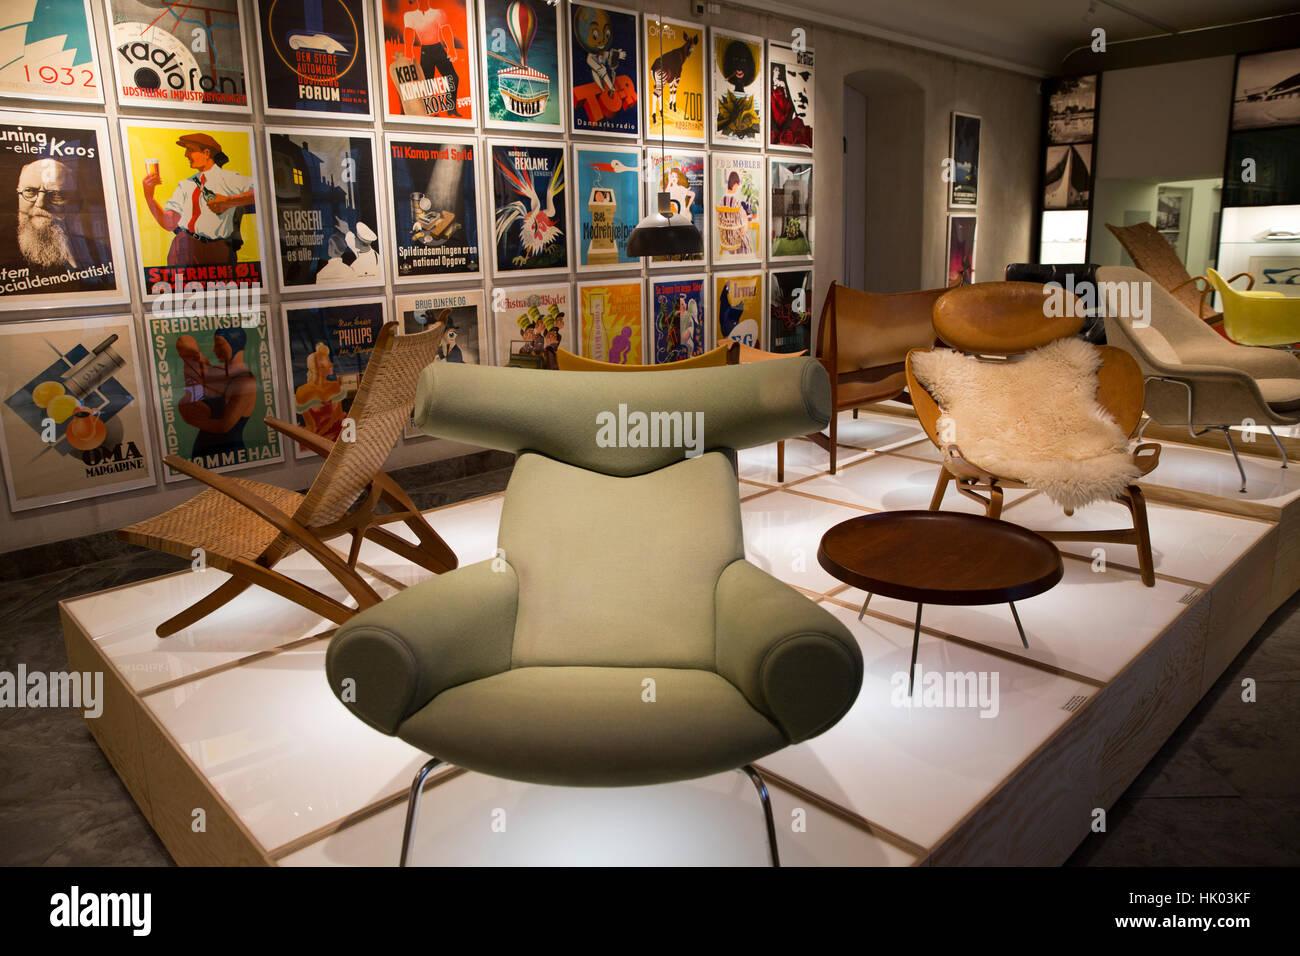 denmark copenhagen bredgade design museum interior 20th century stock photo 132153939 alamy. Black Bedroom Furniture Sets. Home Design Ideas